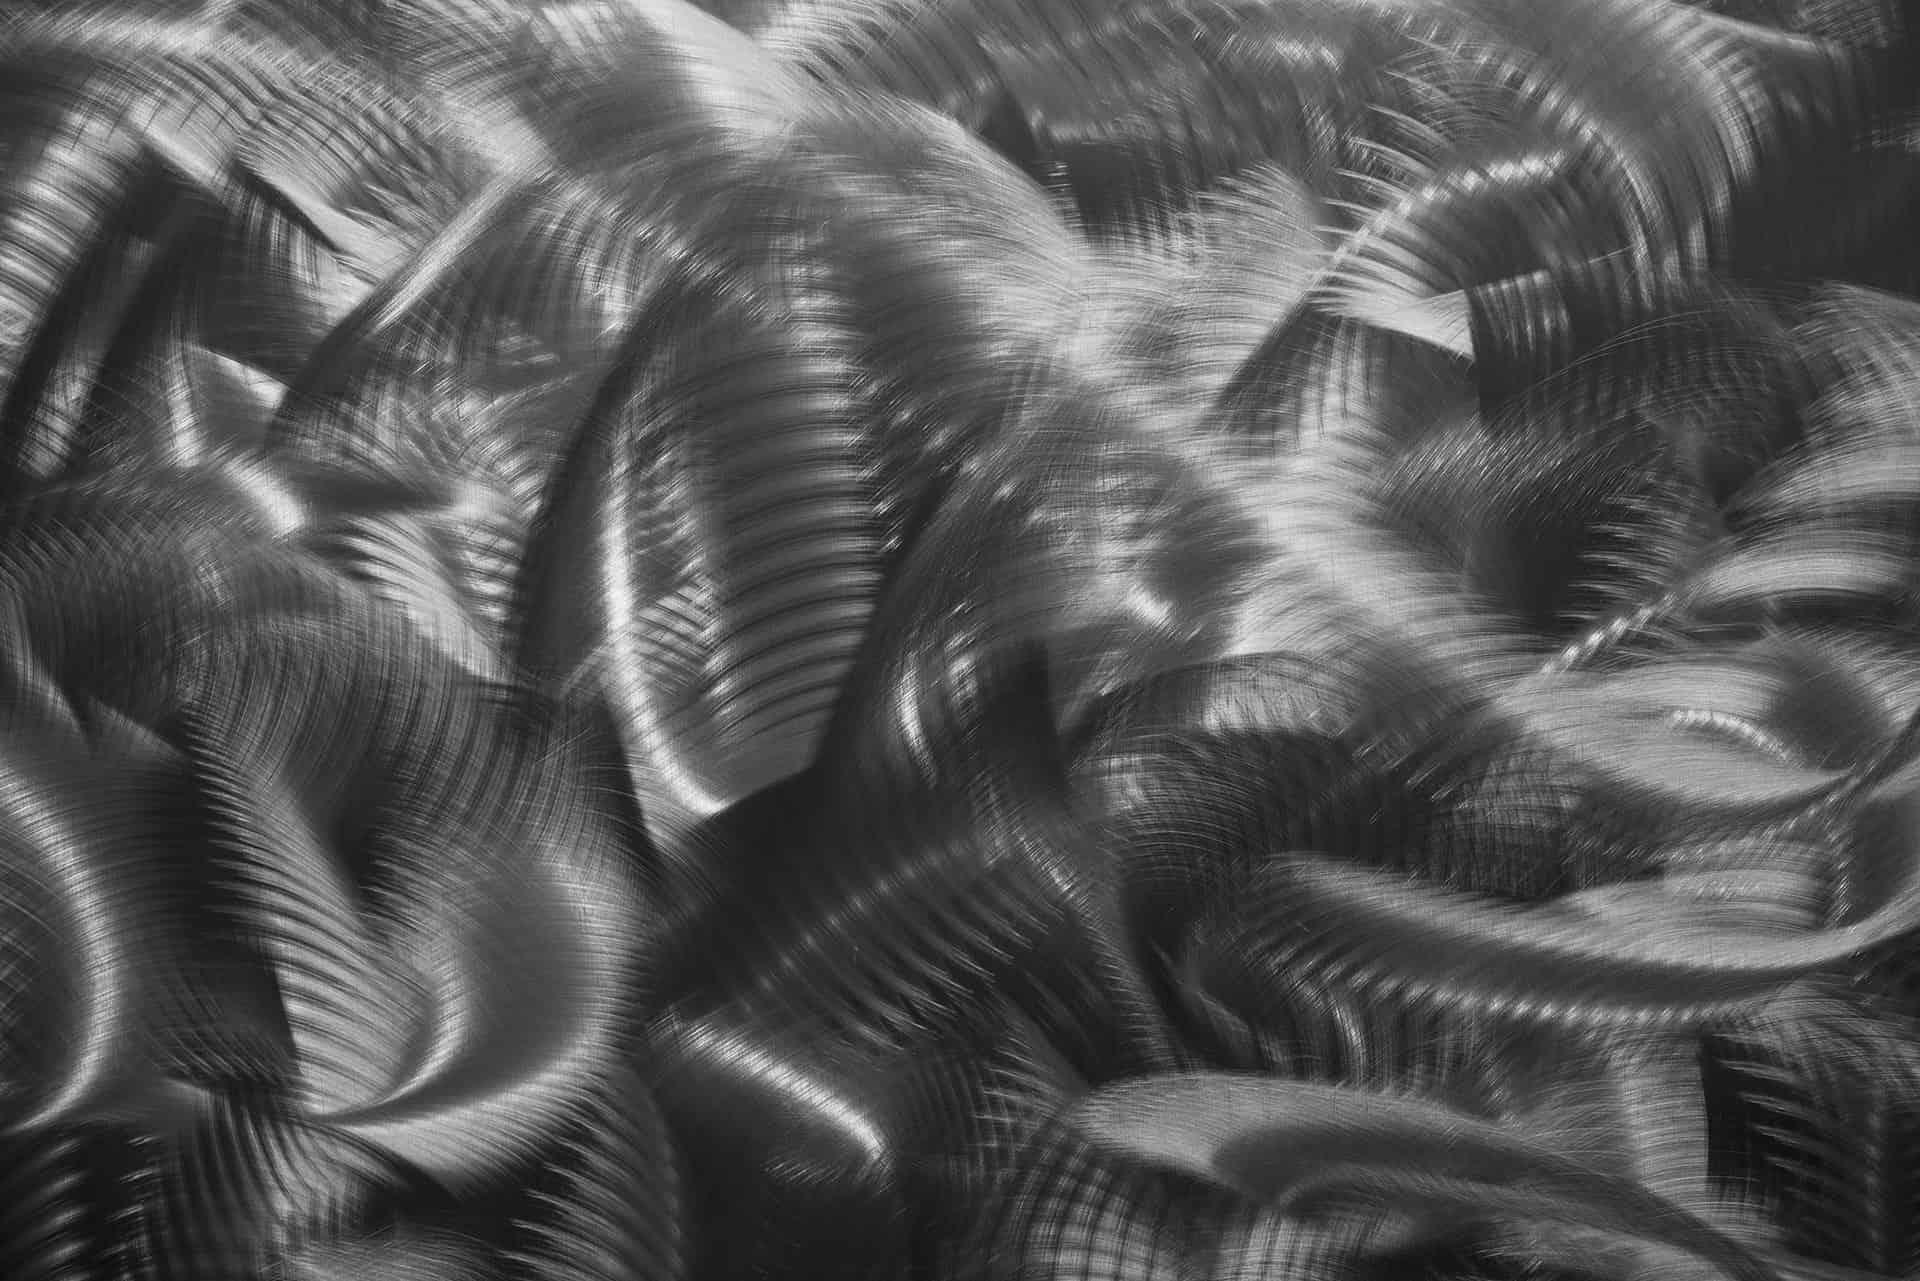 artnorama - Grey Swirls